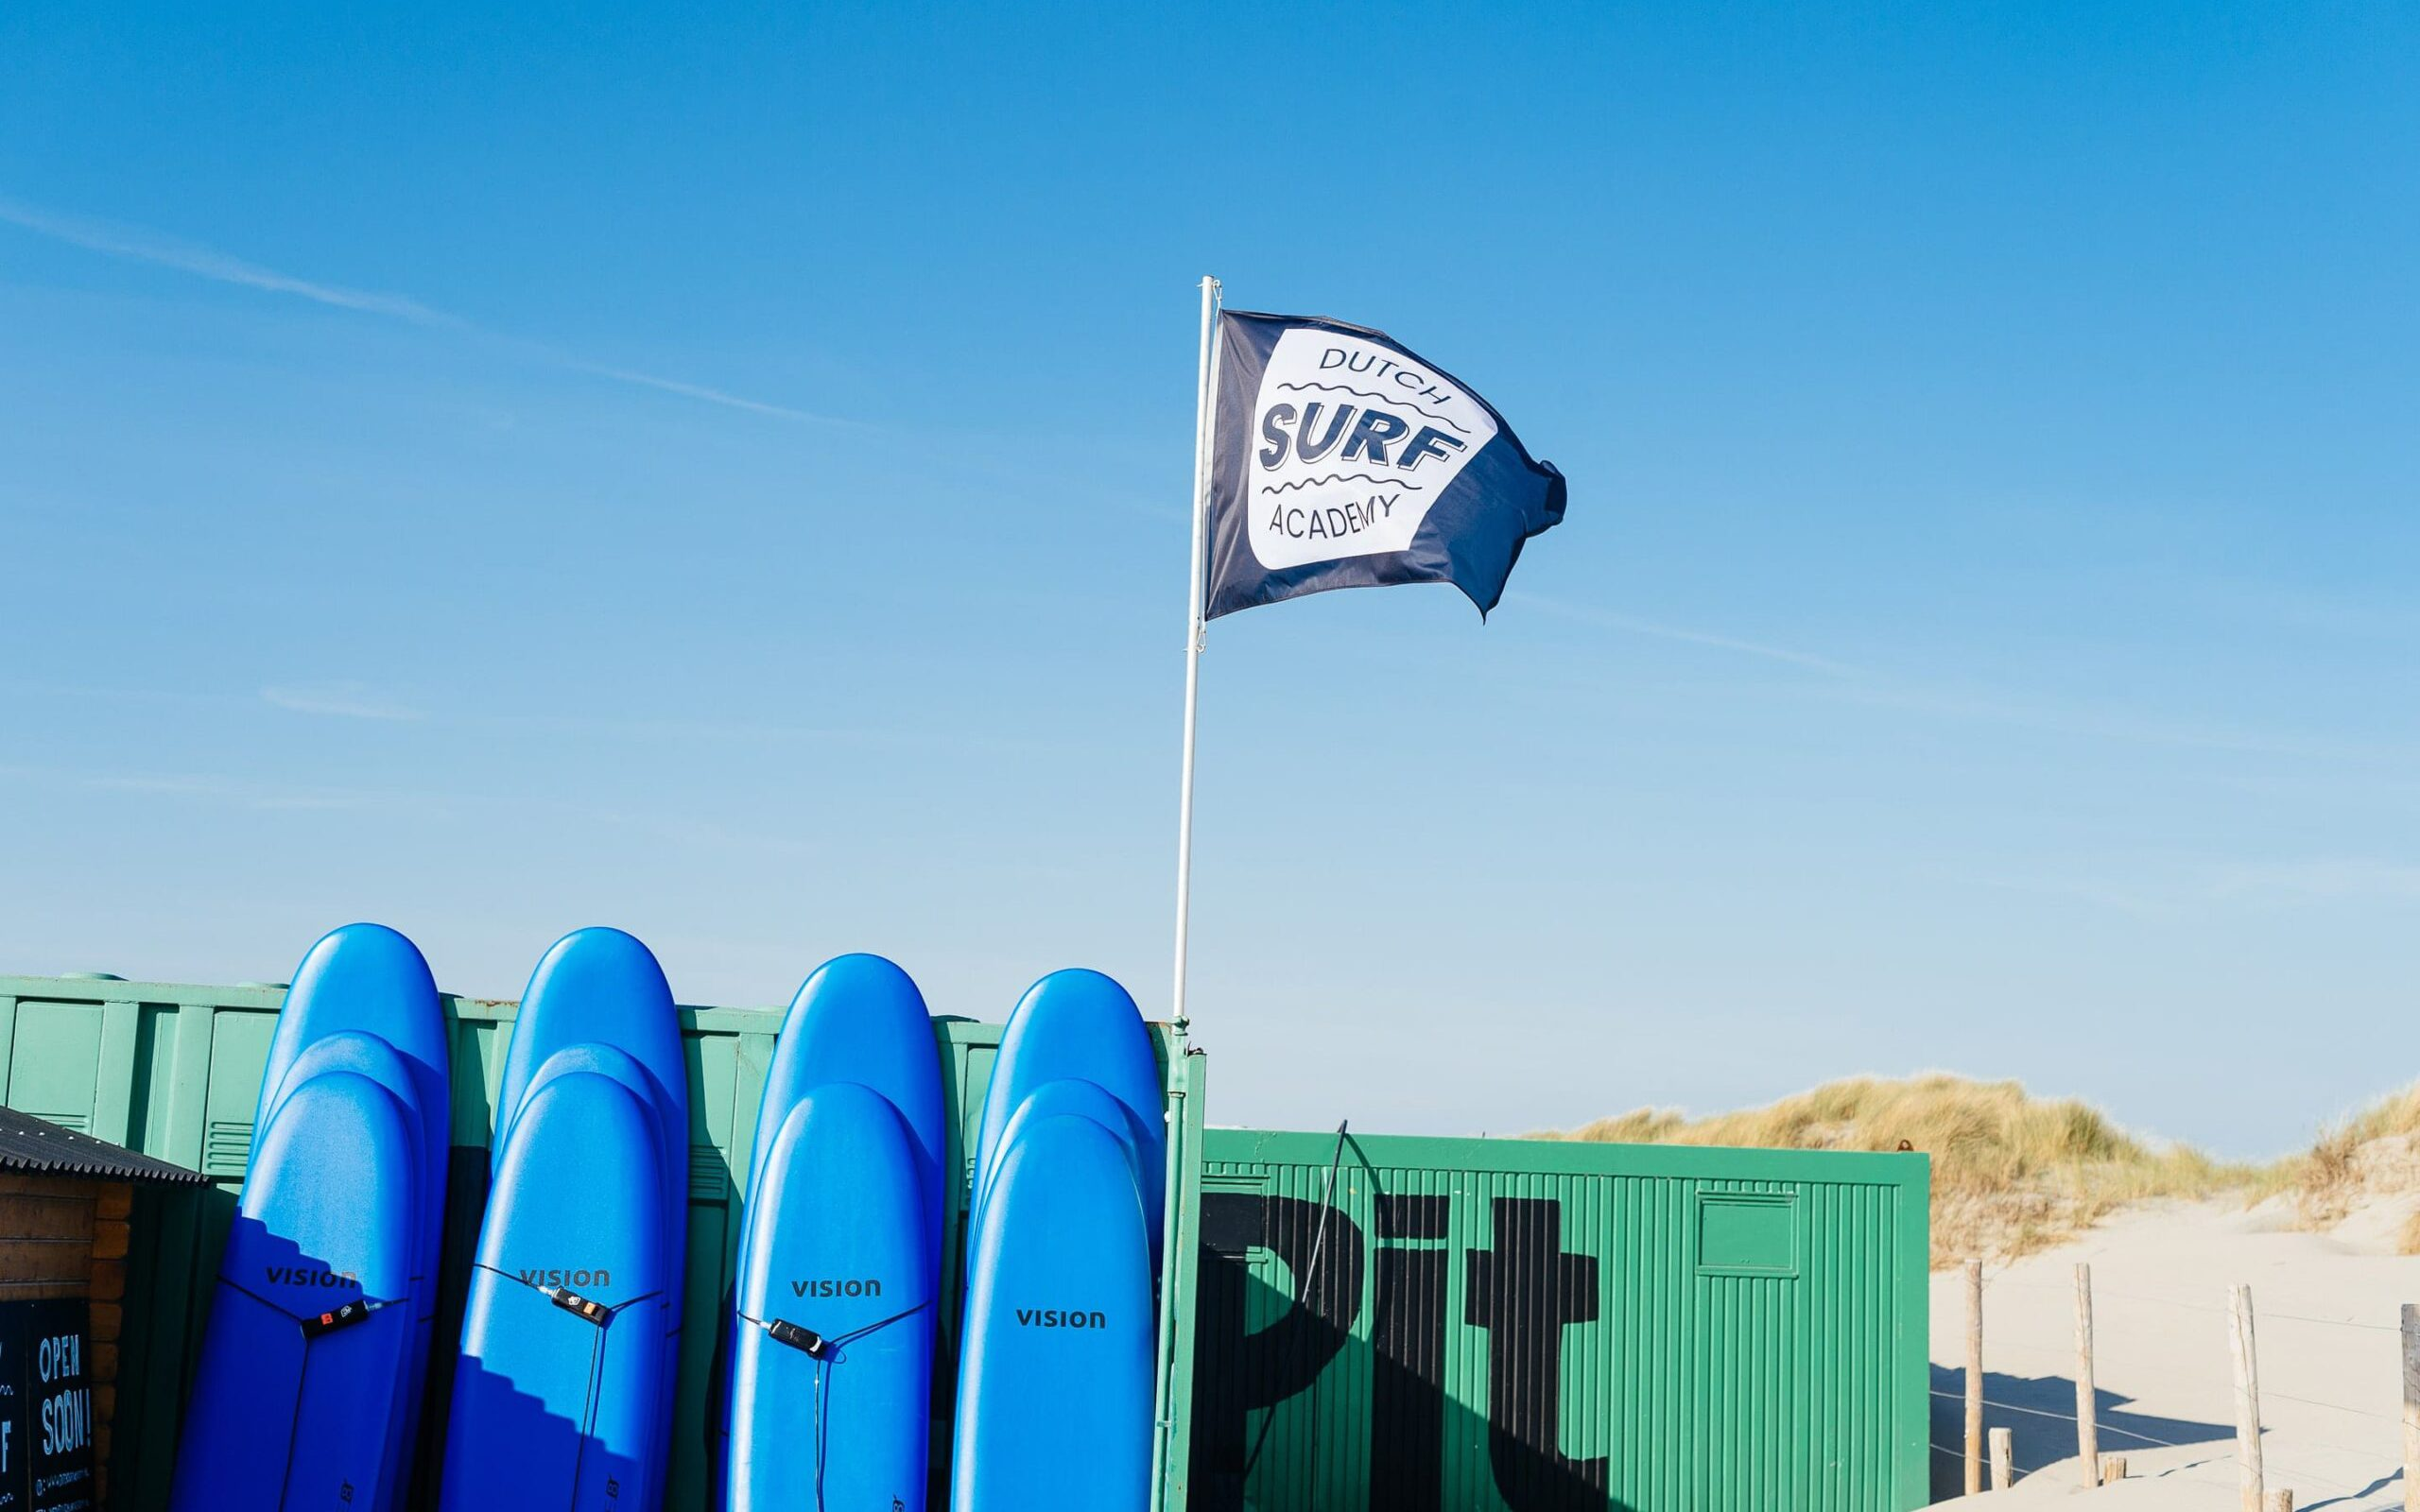 Surfschool surfboard westland